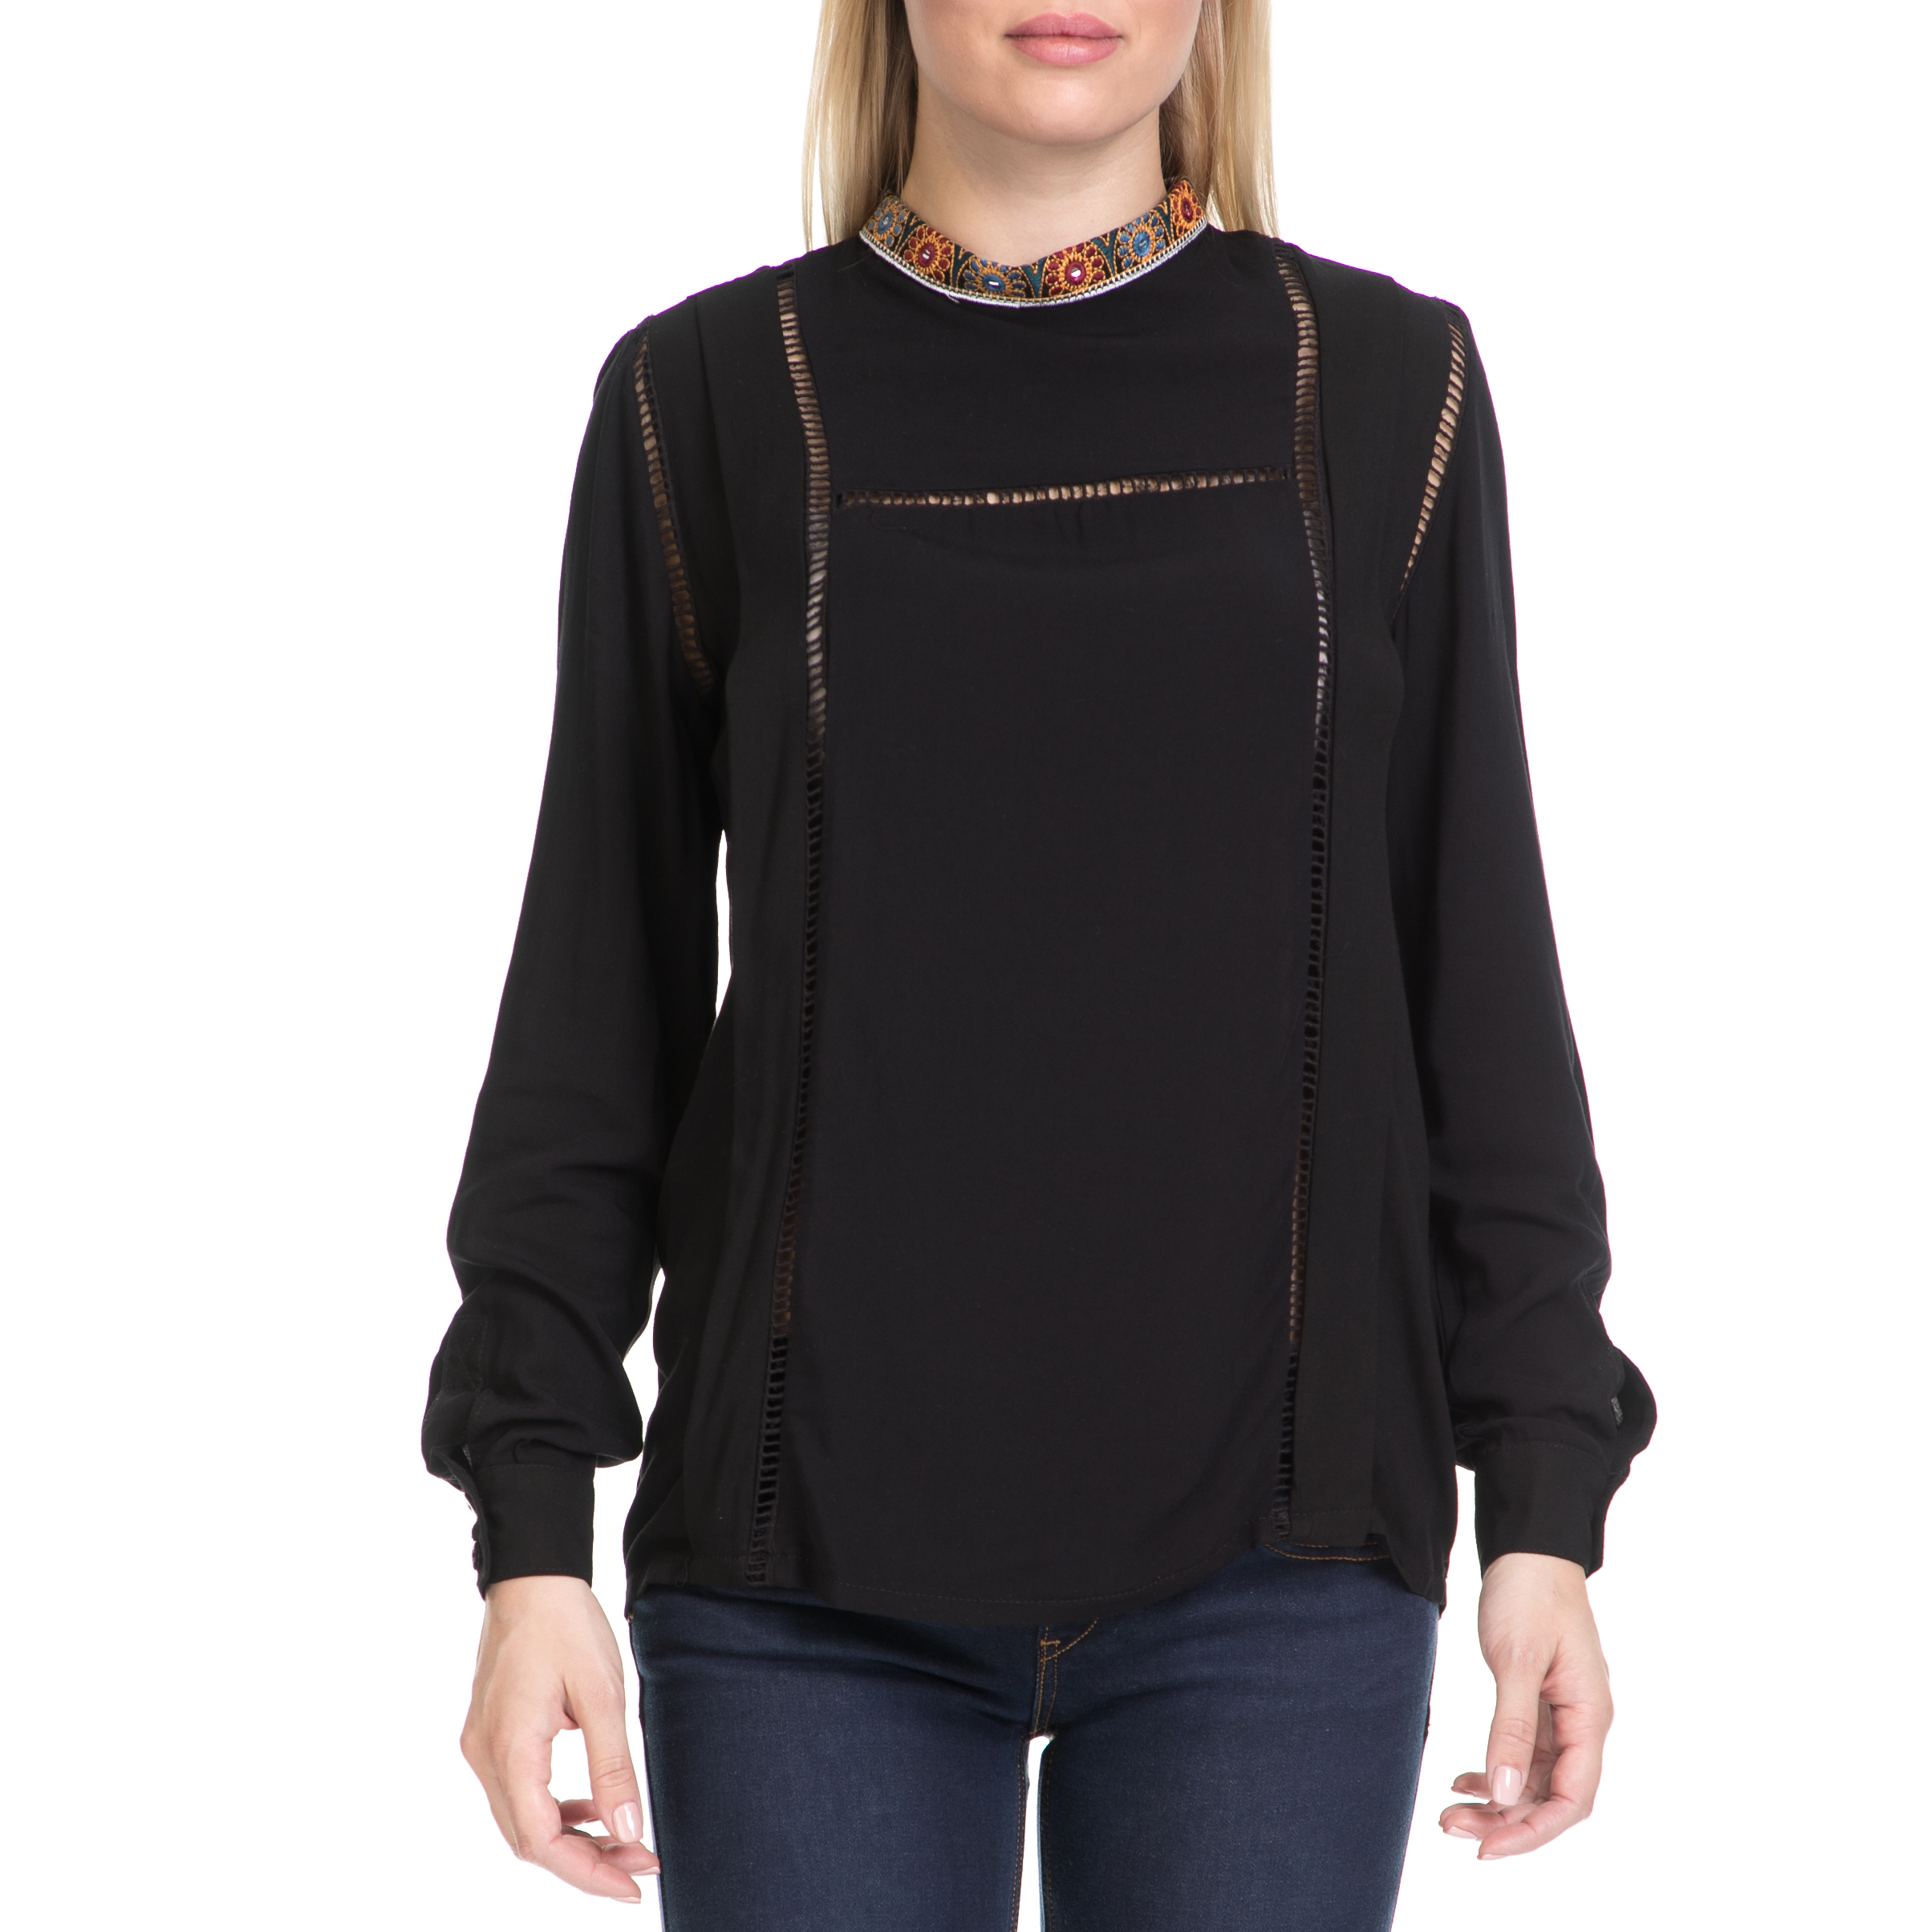 MYMOO - Γυναικεία μπλούζα MYMOO μαύρη γυναικεία ρούχα μπλούζες μακρυμάνικα